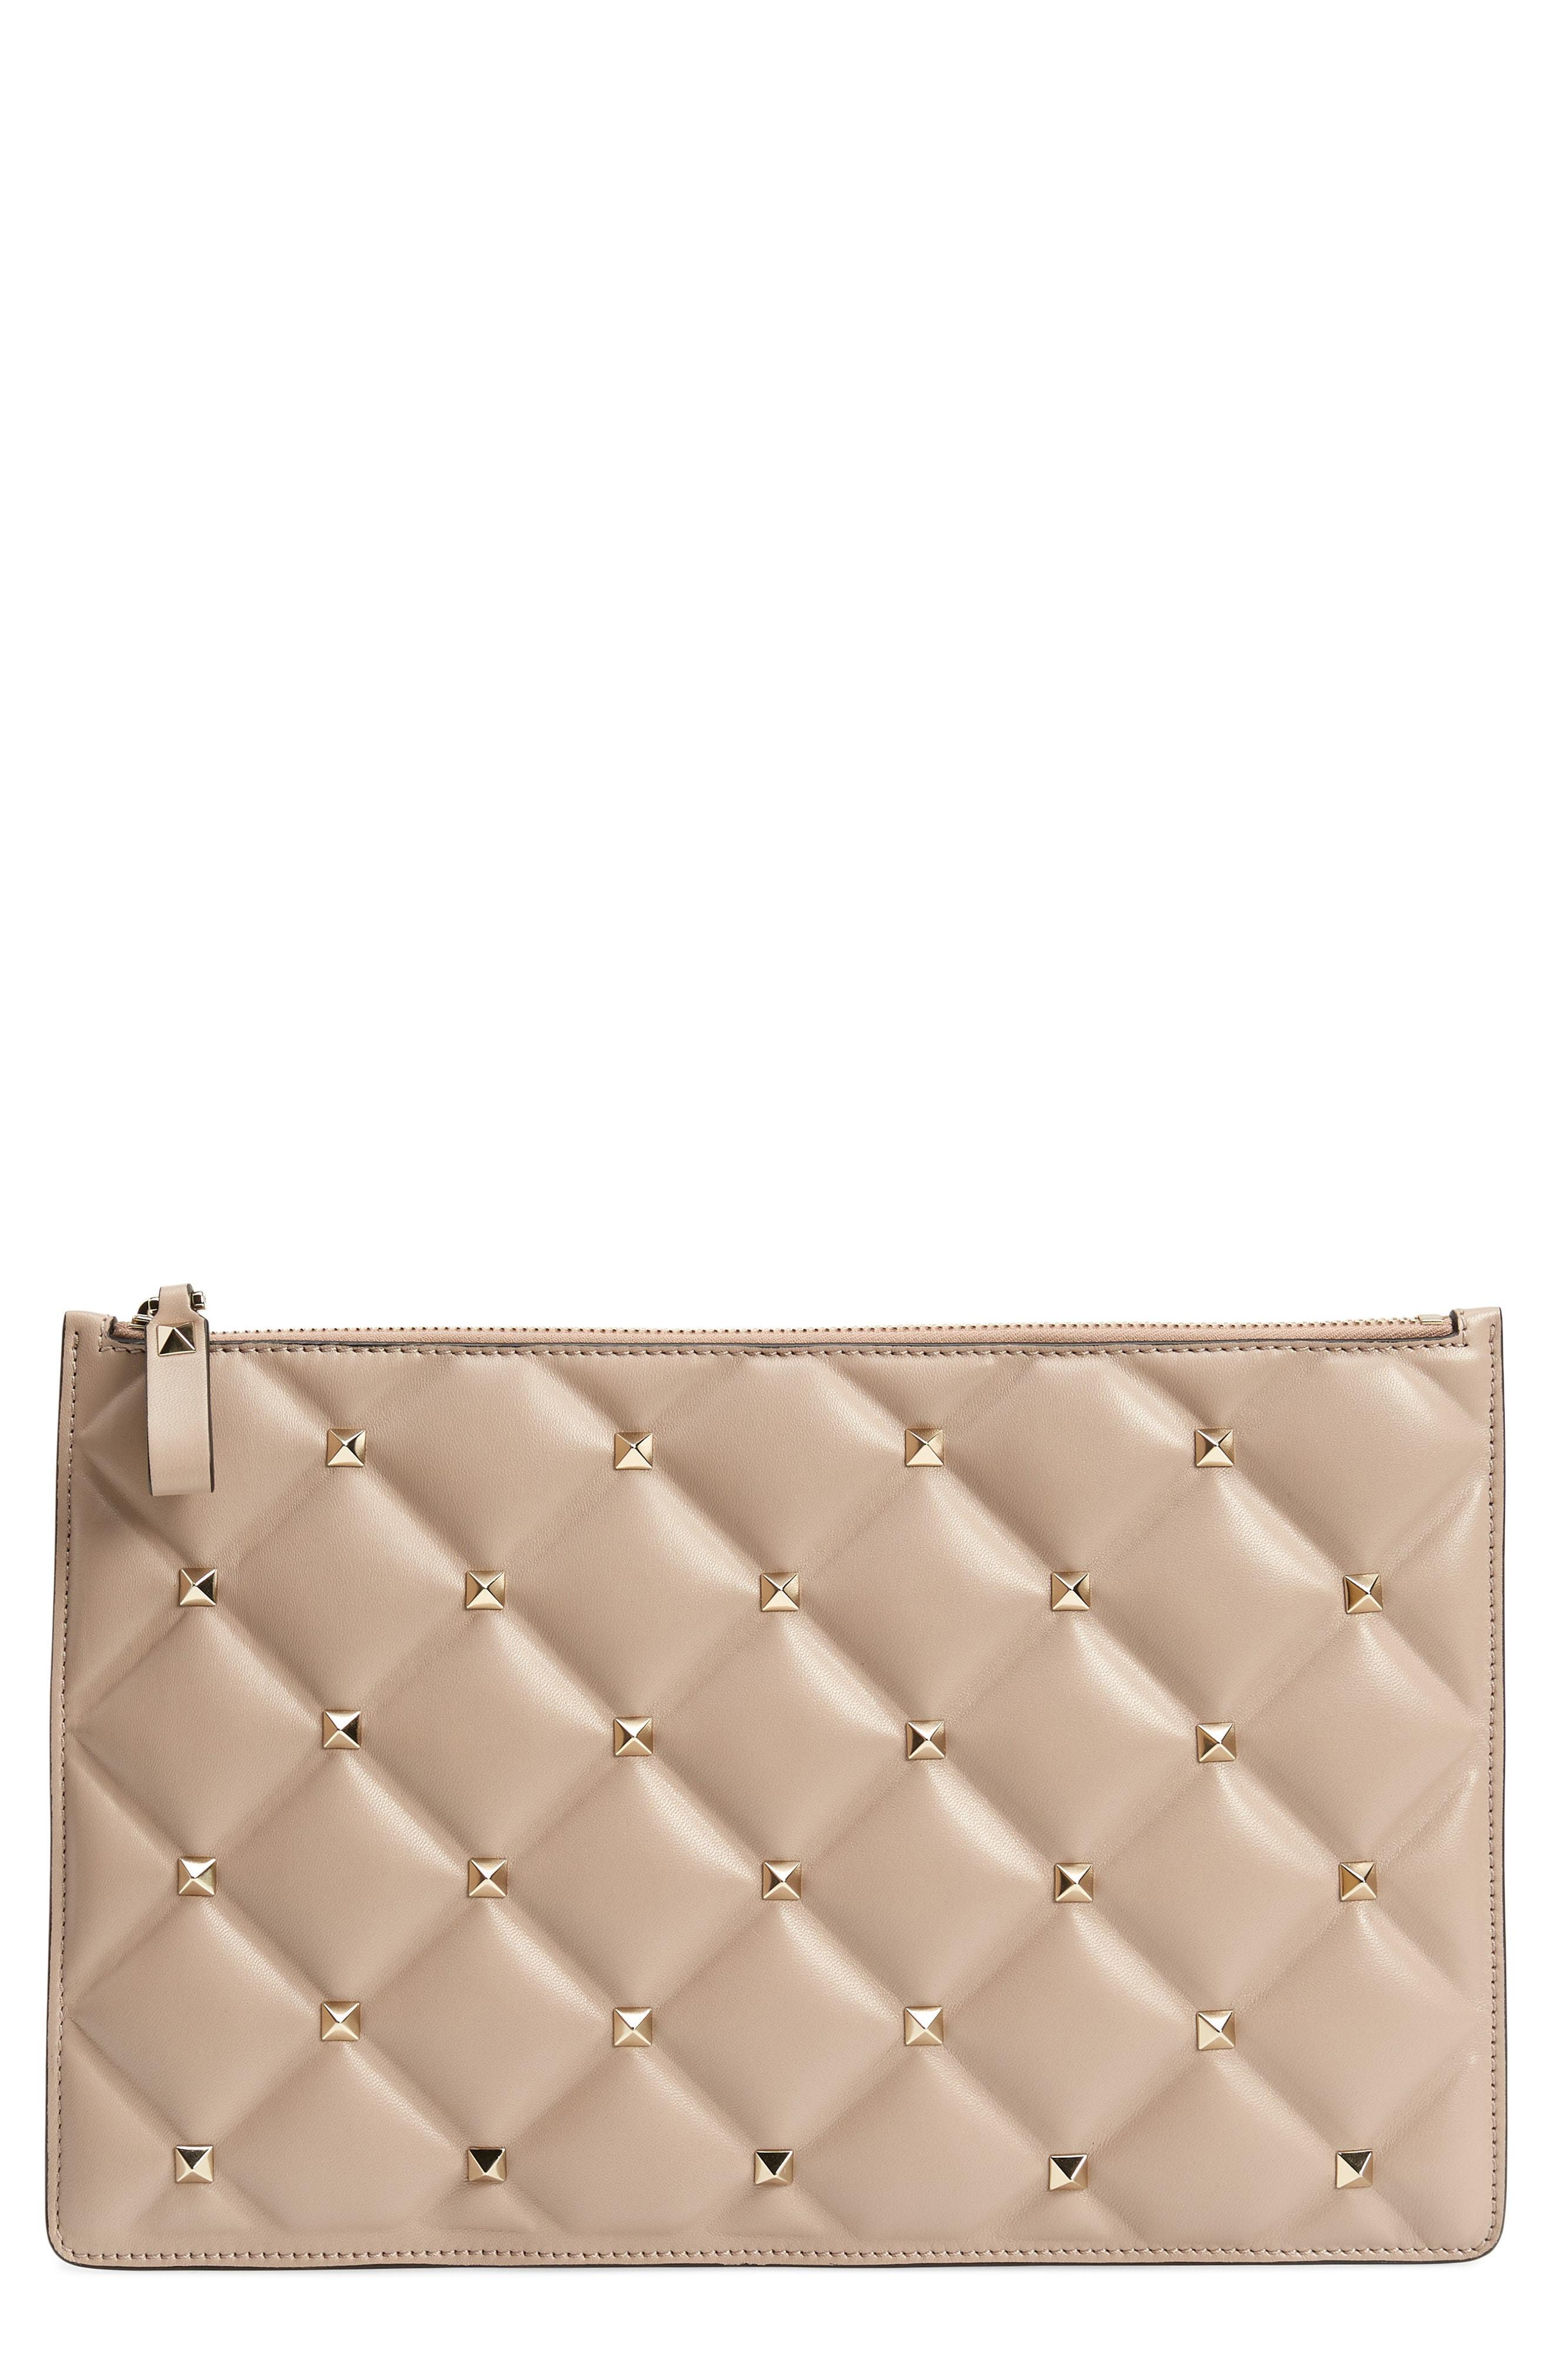 Valentino Garavani Large Candystud Leather Pouch